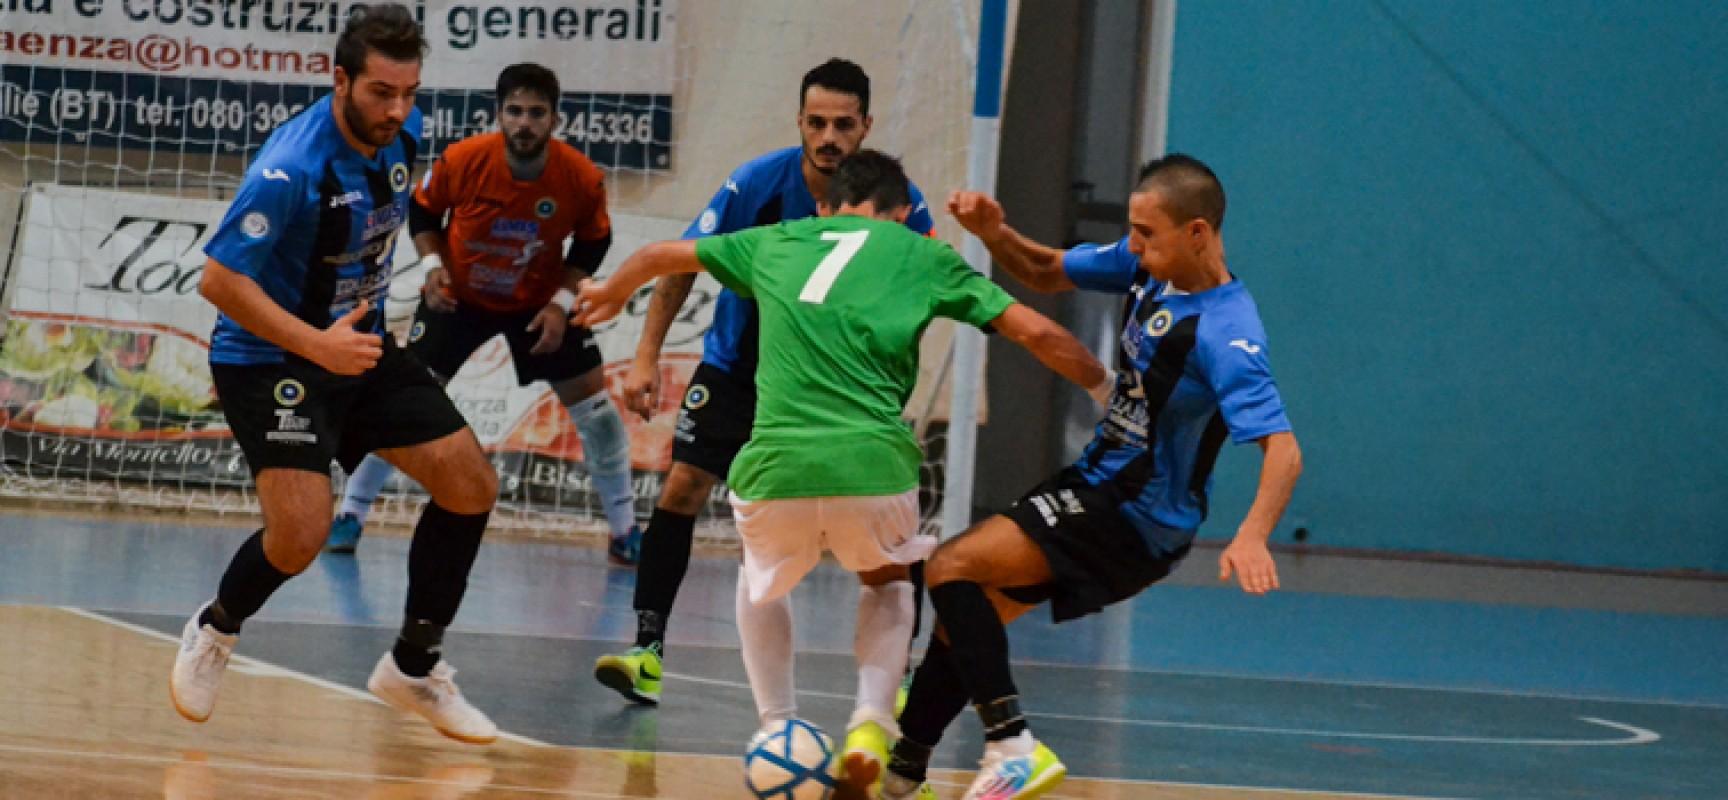 FINALE: Futsal Bisceglie-Conversano 7-3